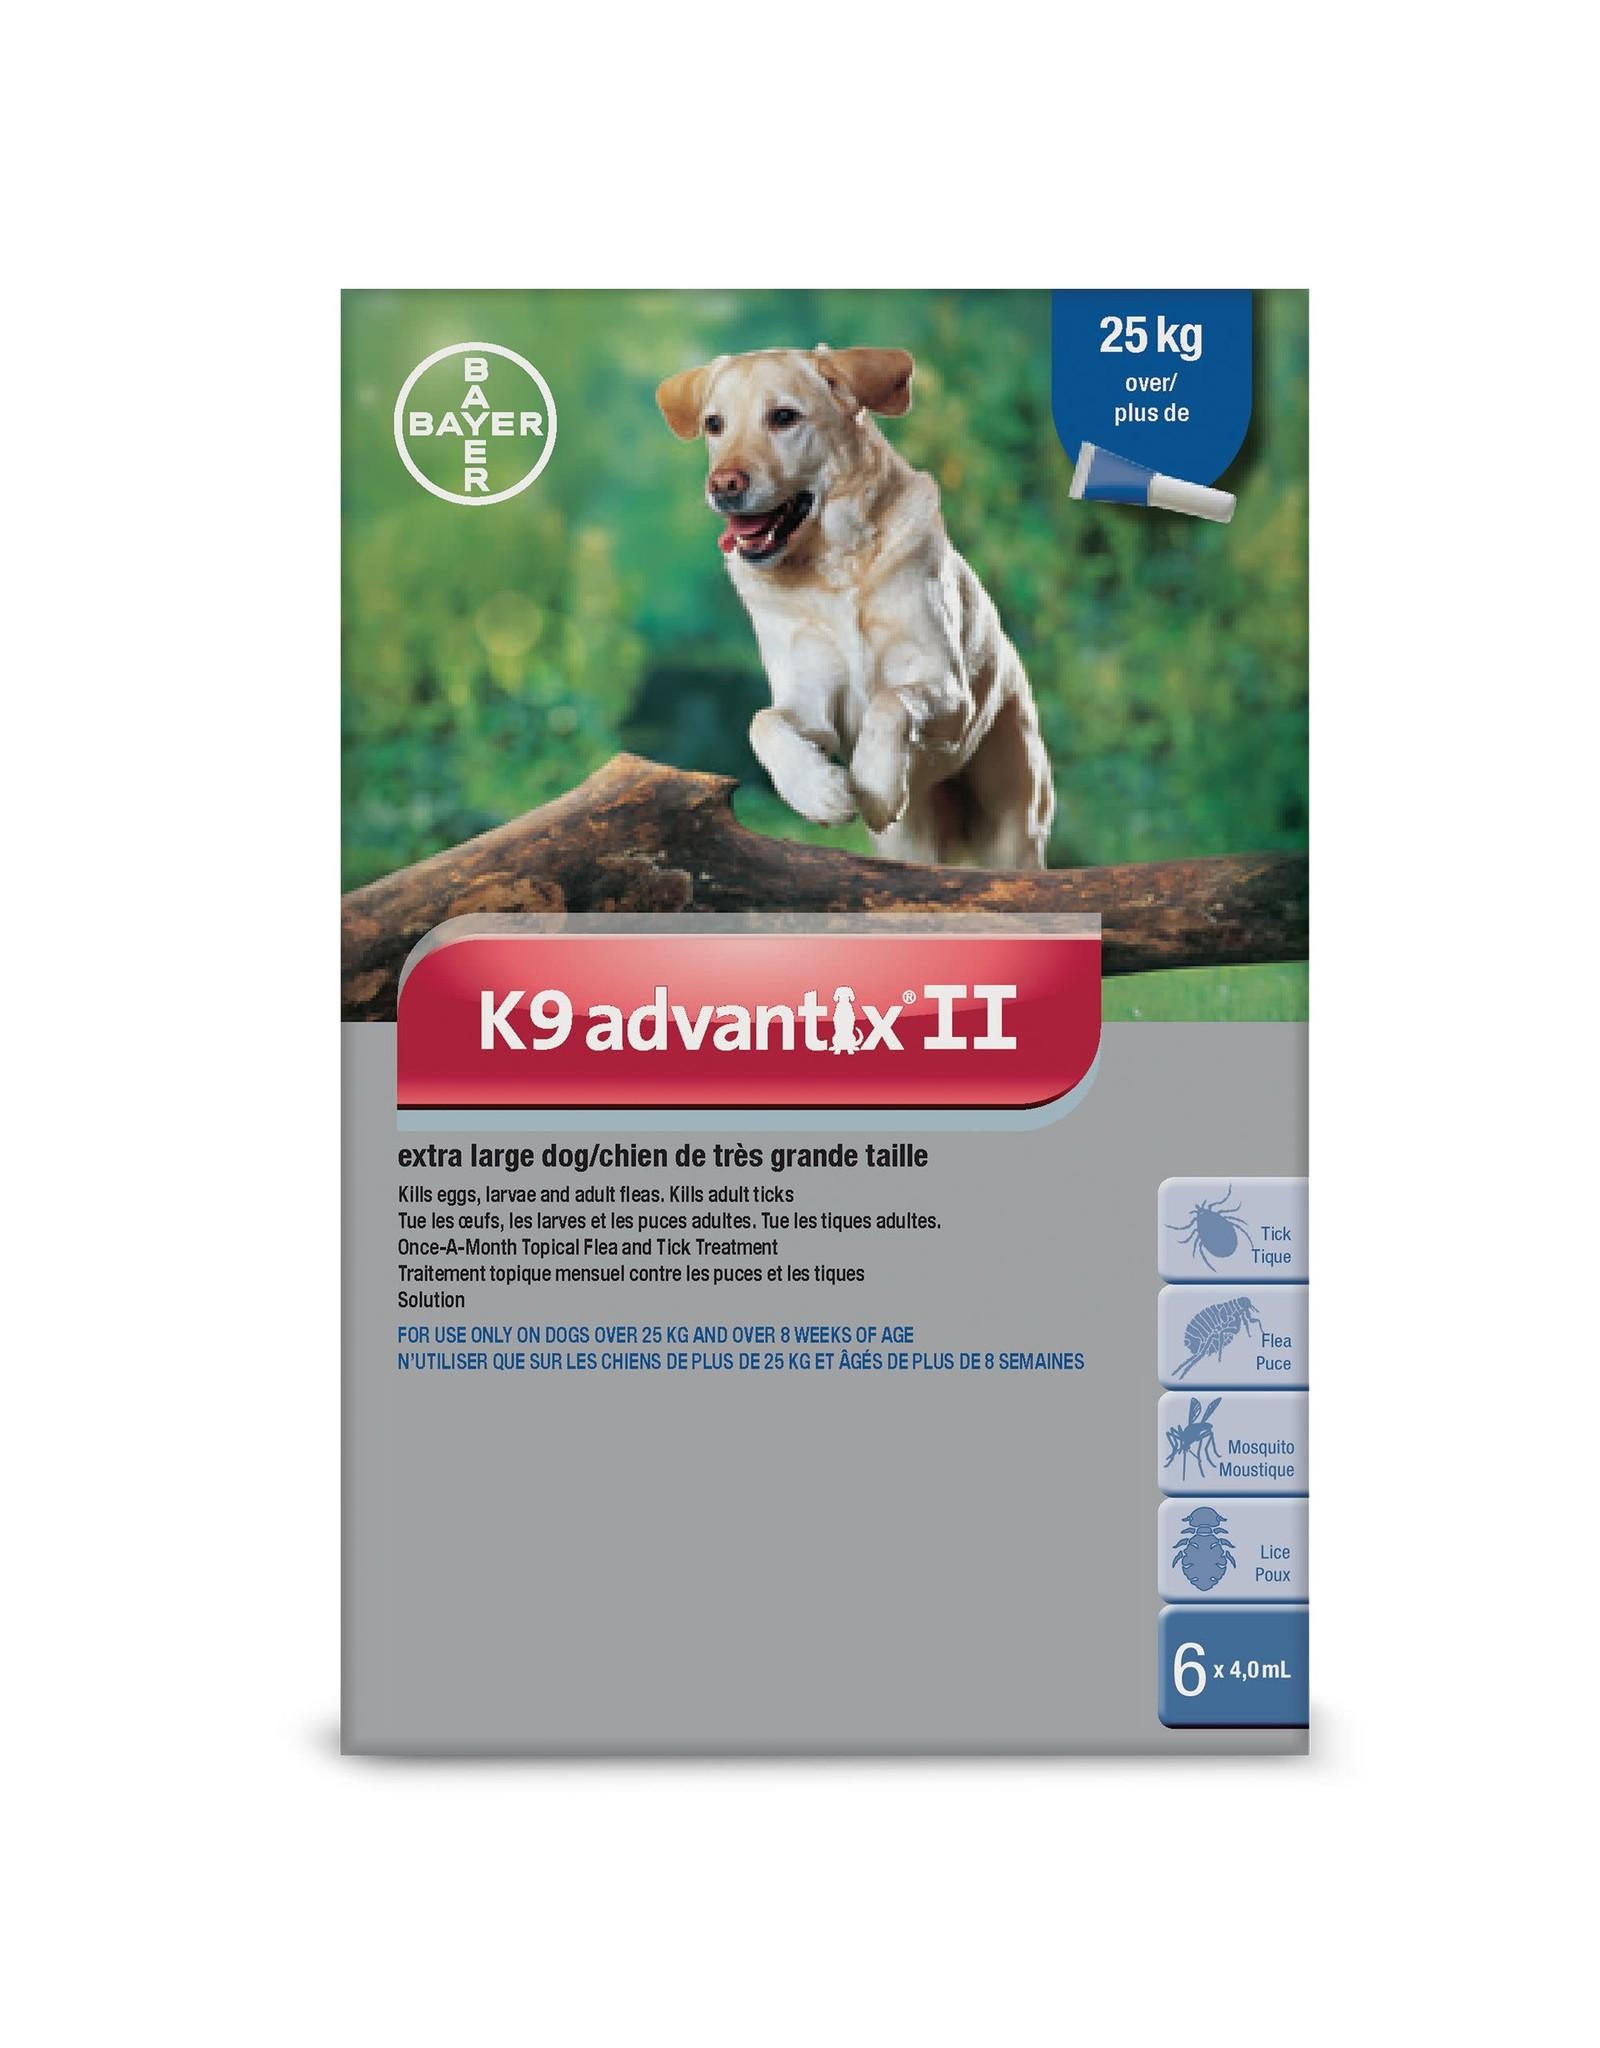 Bayer K9 Advantix II - over 25kg, 6 doses